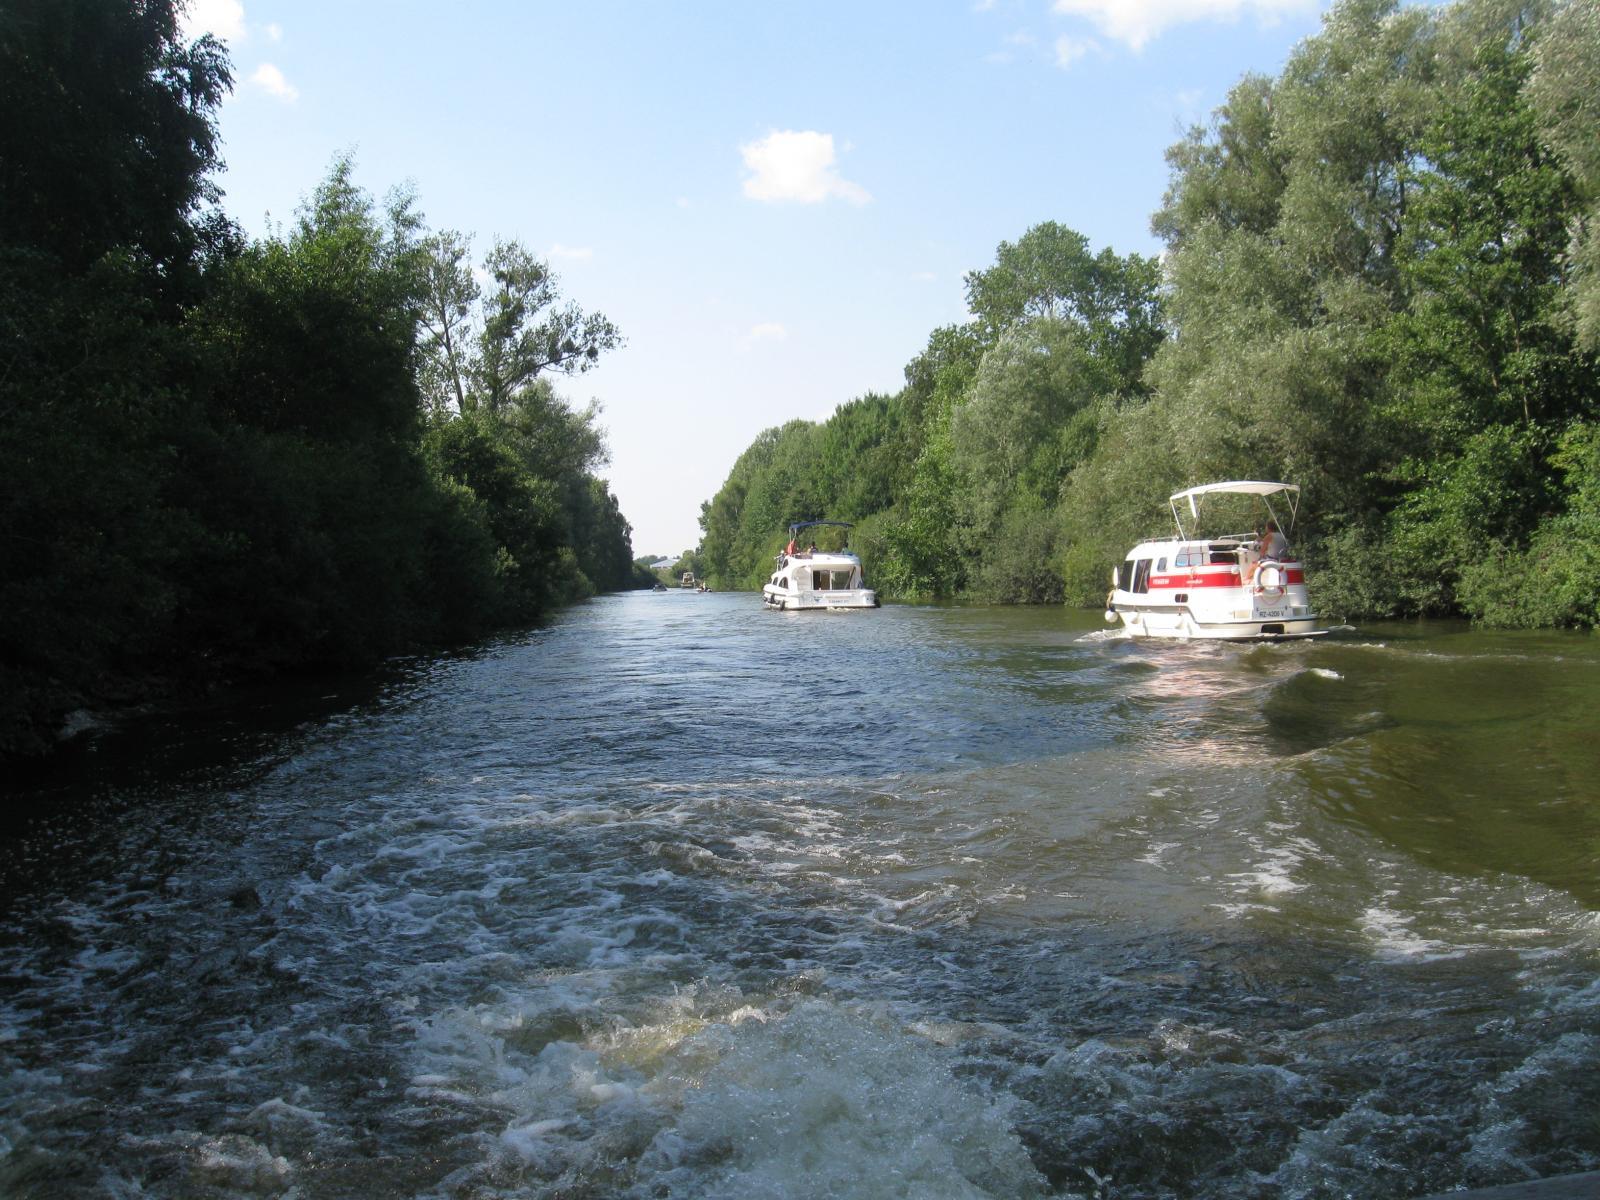 2018 -Müritzsee - Urlaub.JPG